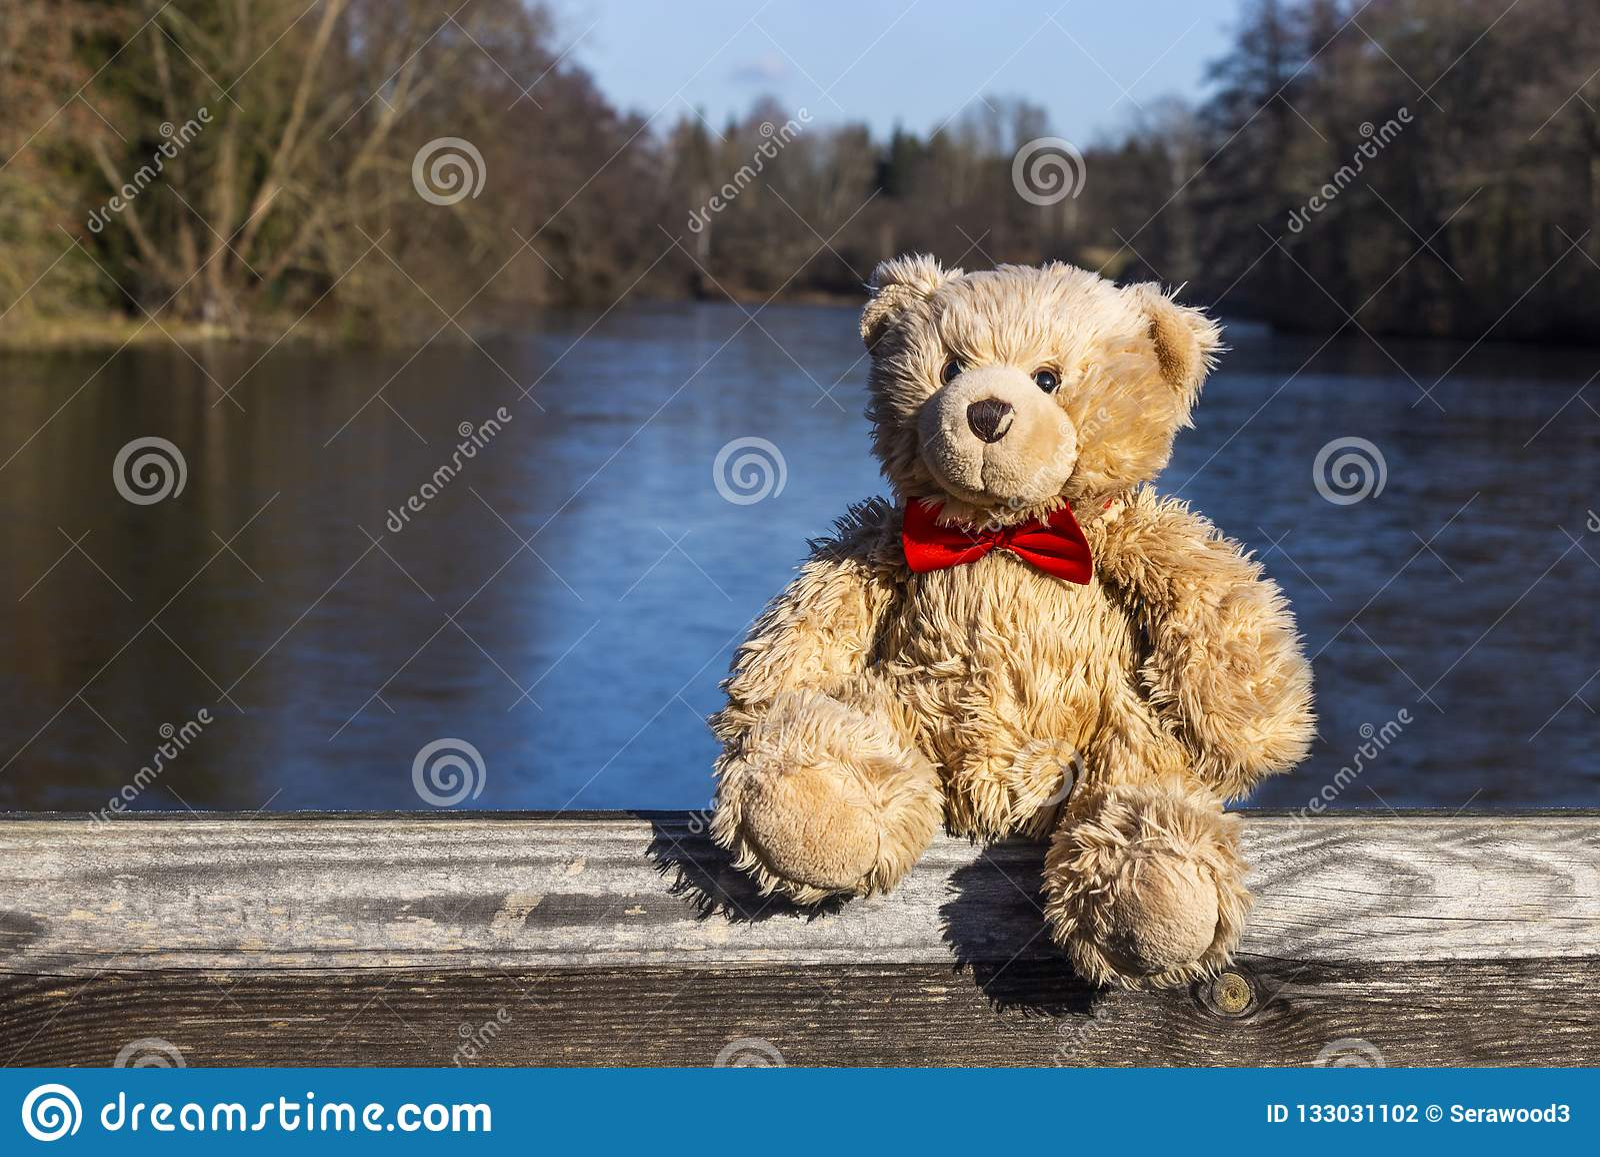 Teddy bear near partially frozen pond in winter.